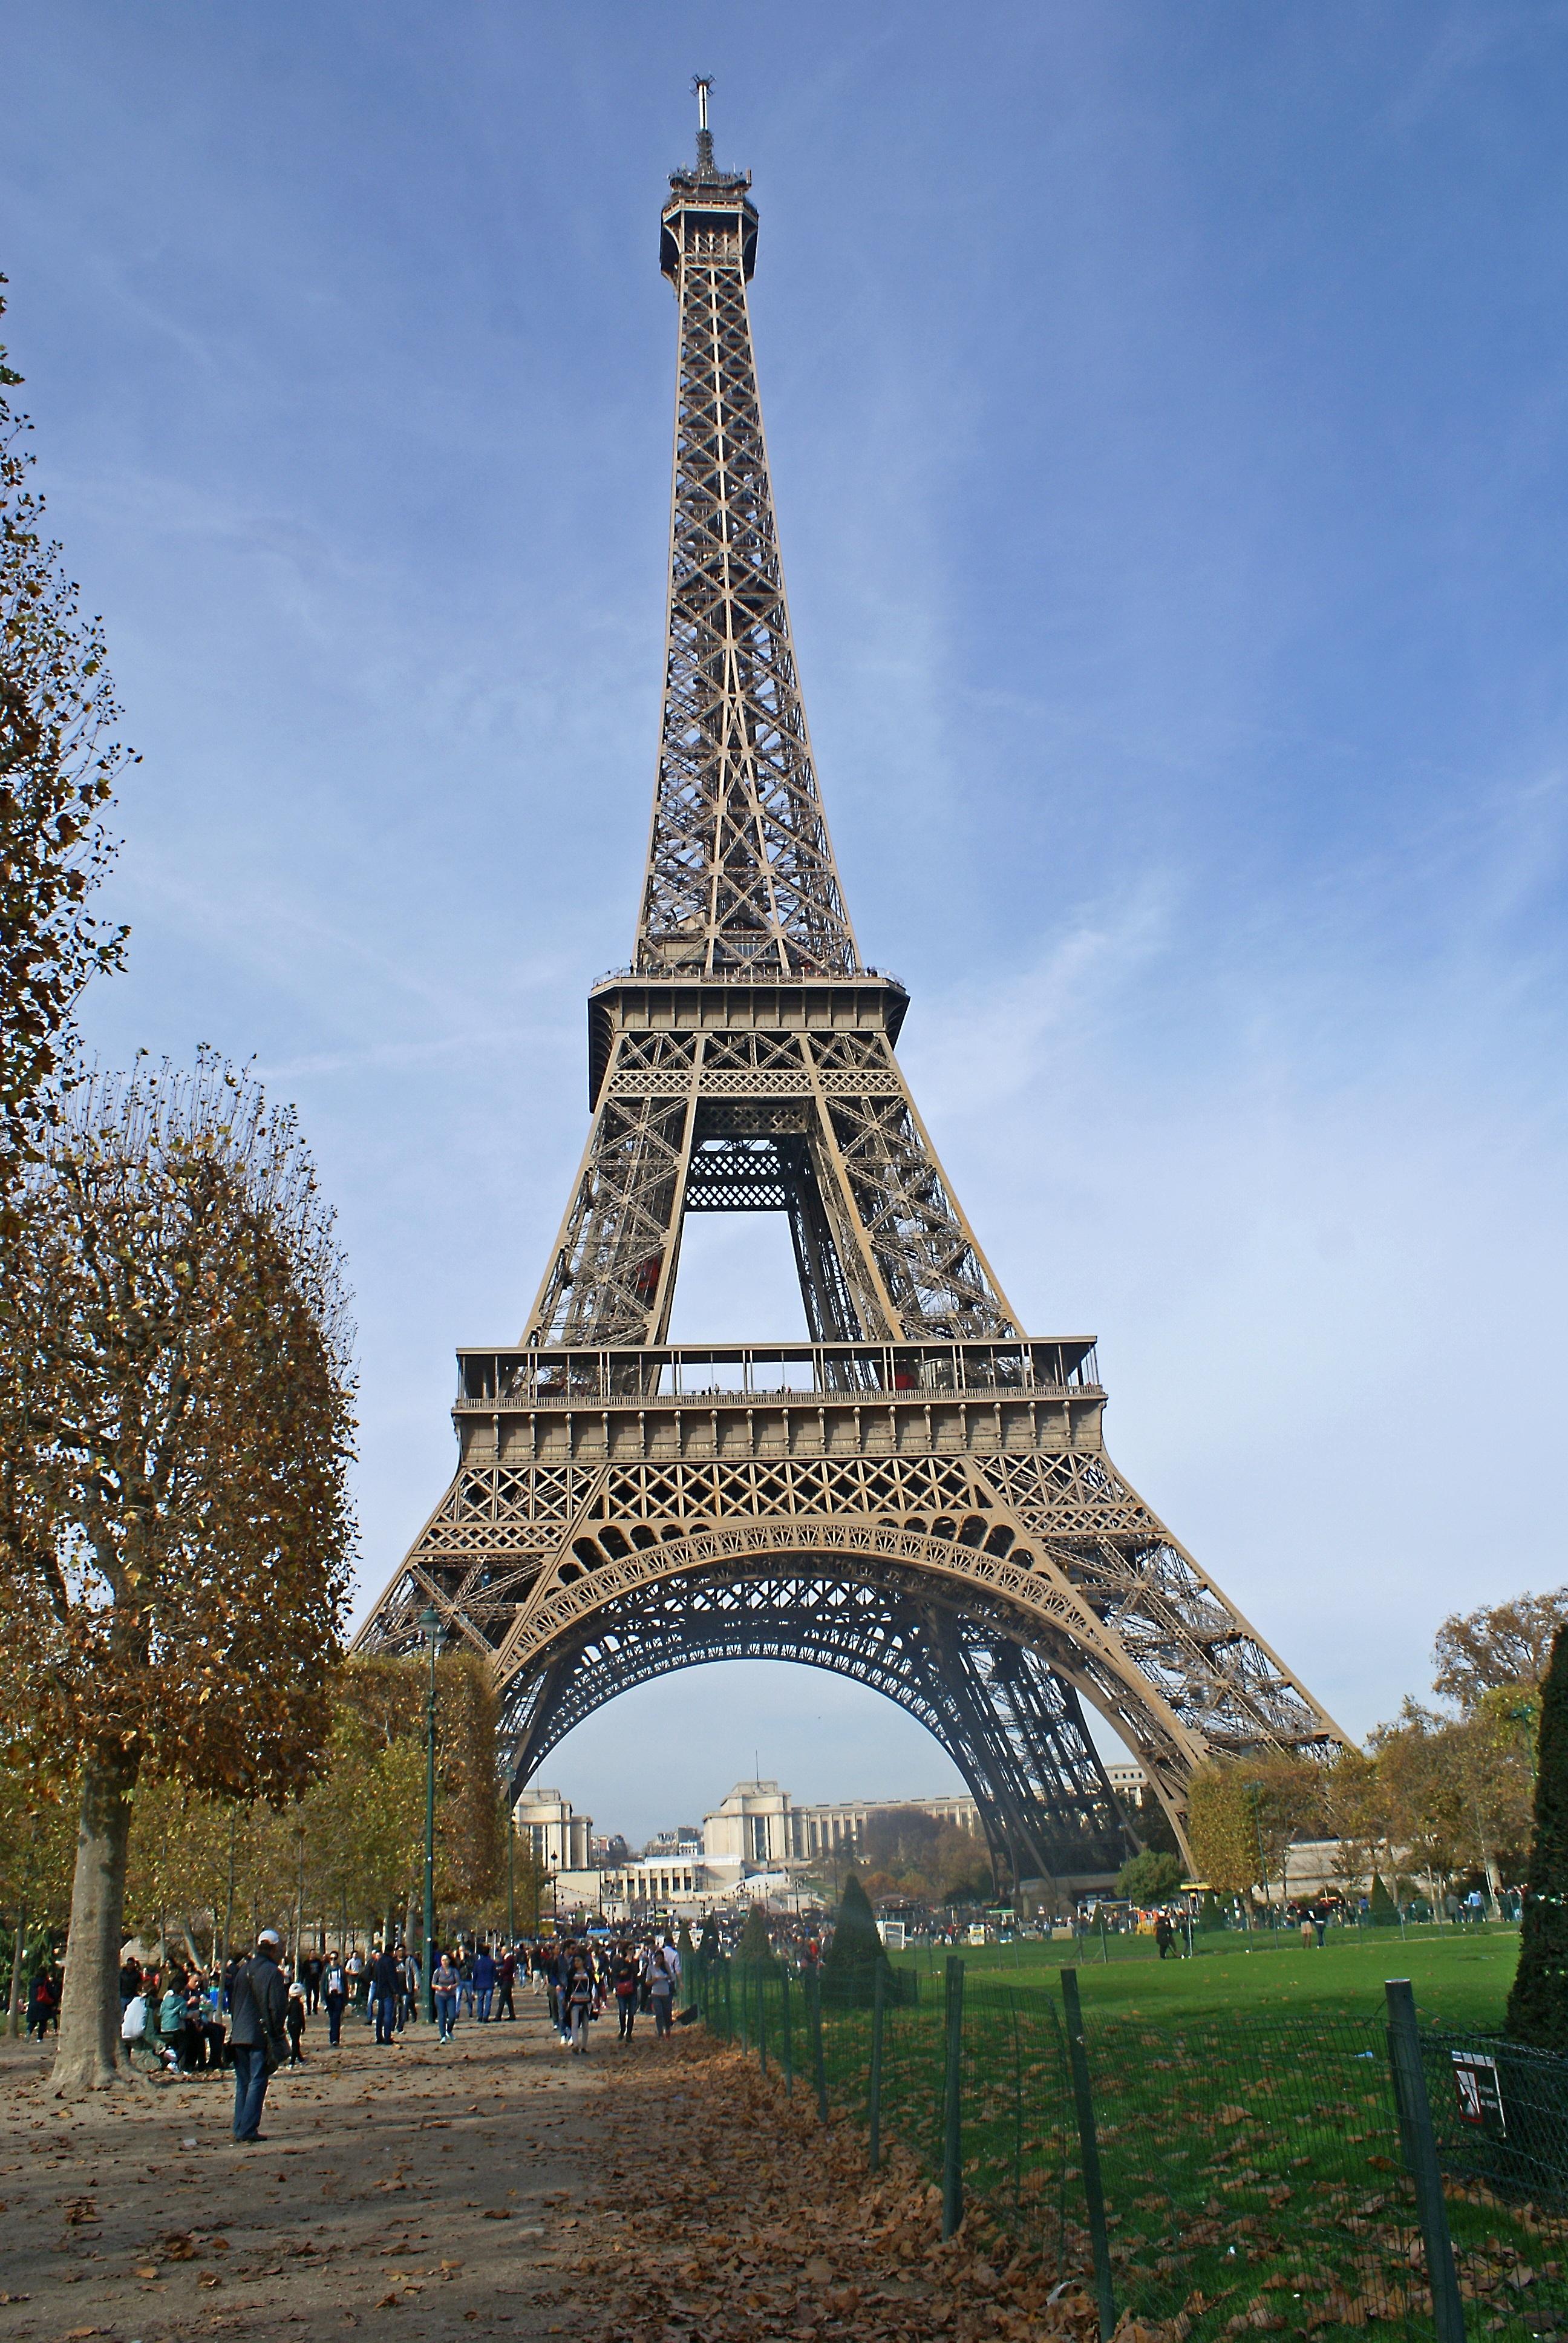 Gambar arsitektur melihat bangunan kota menara eiffel paris arsitektur melihat bangunan kota menara eiffel paris monumen perancis lengkungan menara simbol taman tengara beristirahat pariwisata thecheapjerseys Images